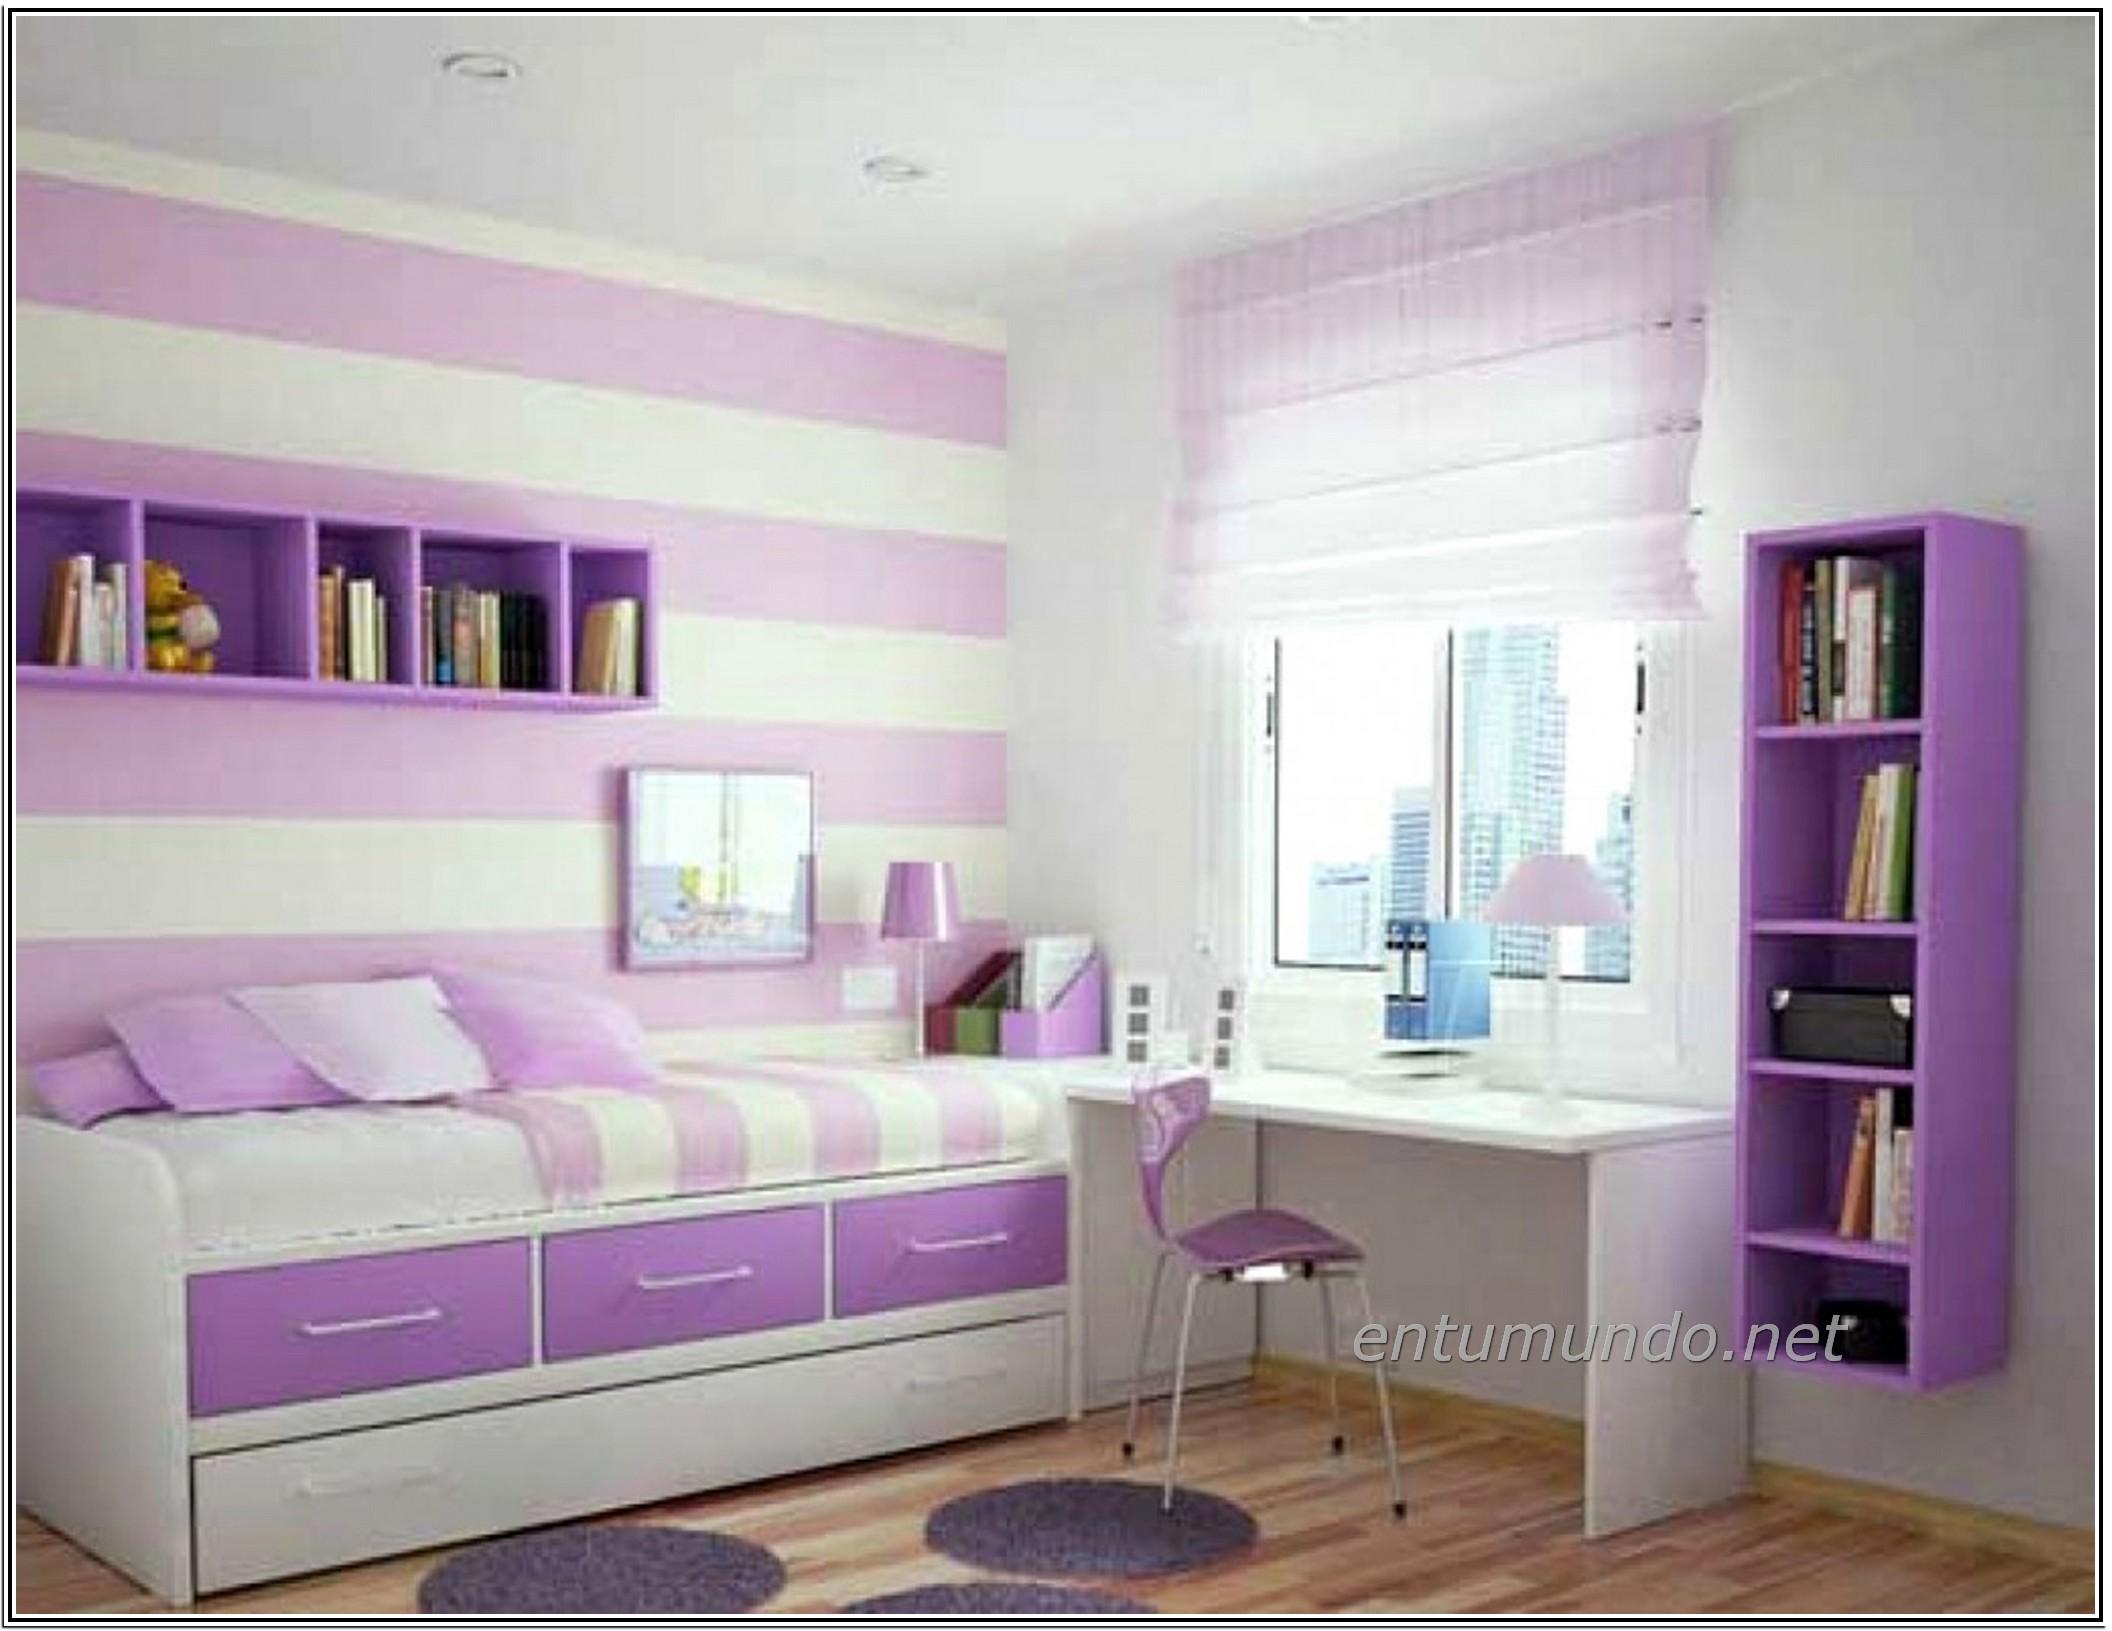 For Teenager Room Room Pink Teenage Girls Inspiration - Bedroom Beds For Teens , HD Wallpaper & Backgrounds